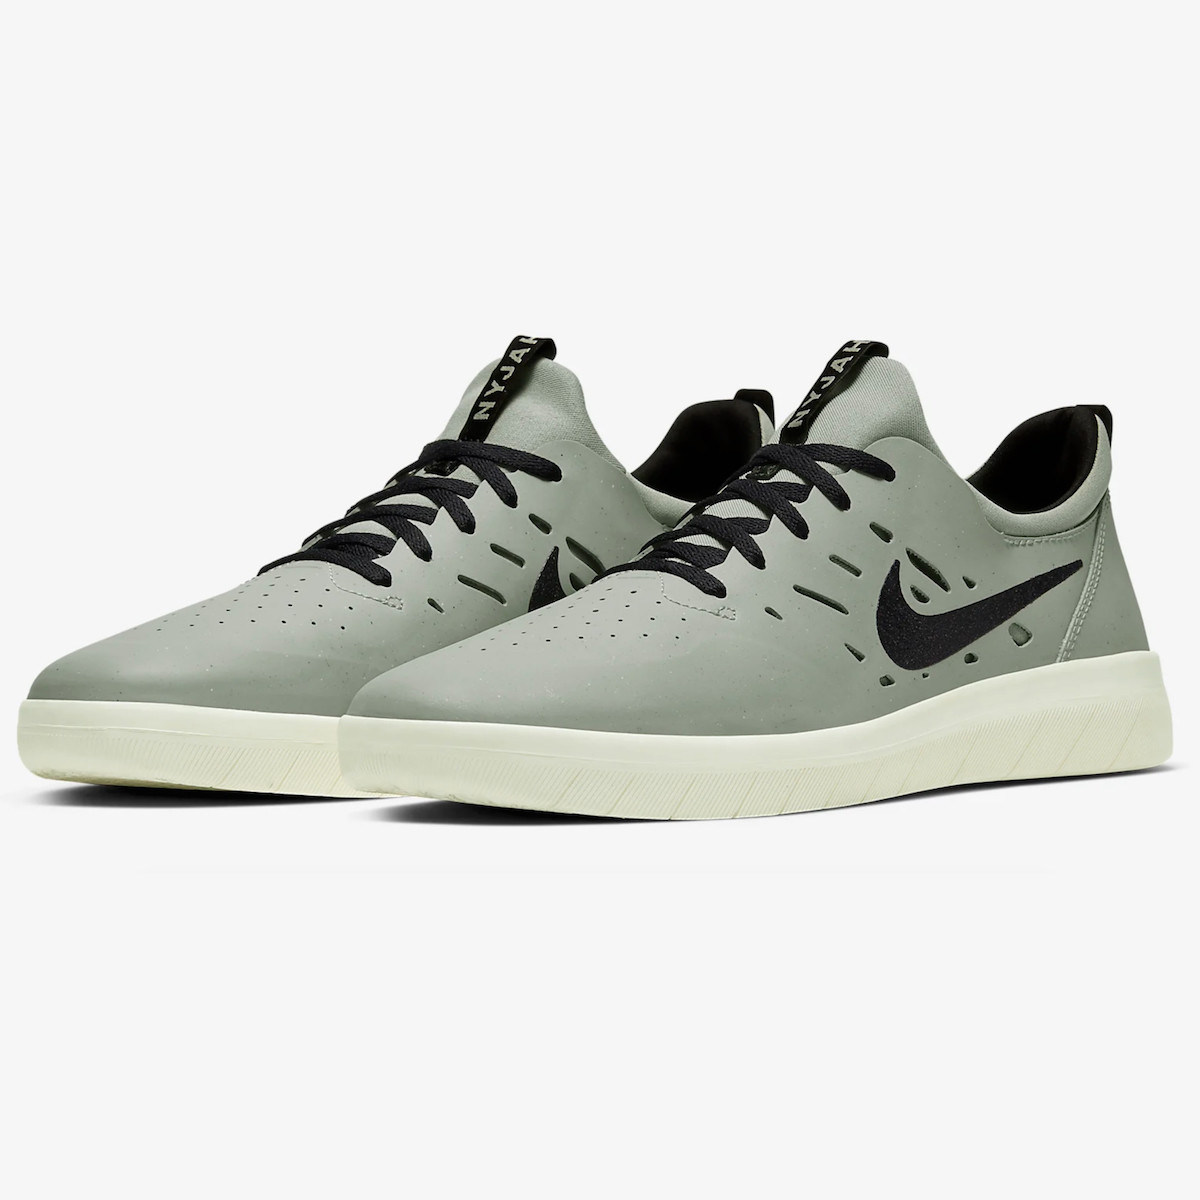 Nike USA, Inc. Nike SB Nyjah Free Jade Horizon/Black